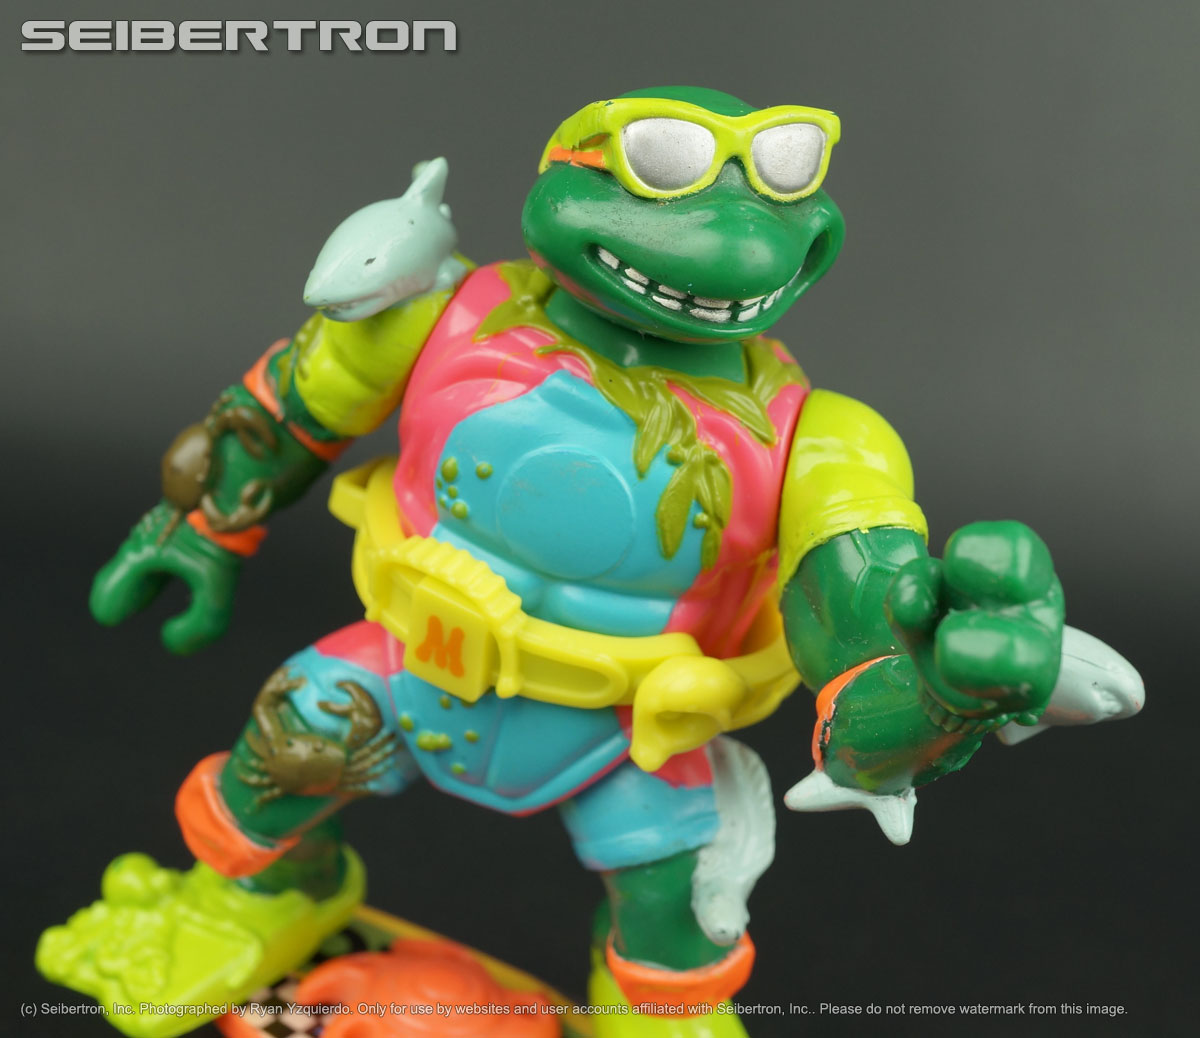 Teenage Mutant Ninja Turtles and Transformers listings from Seibertron.com: MIKE SEWER SURFER Teenage Mutant Ninja Turtles 100% complete vintage 1989 TMNT